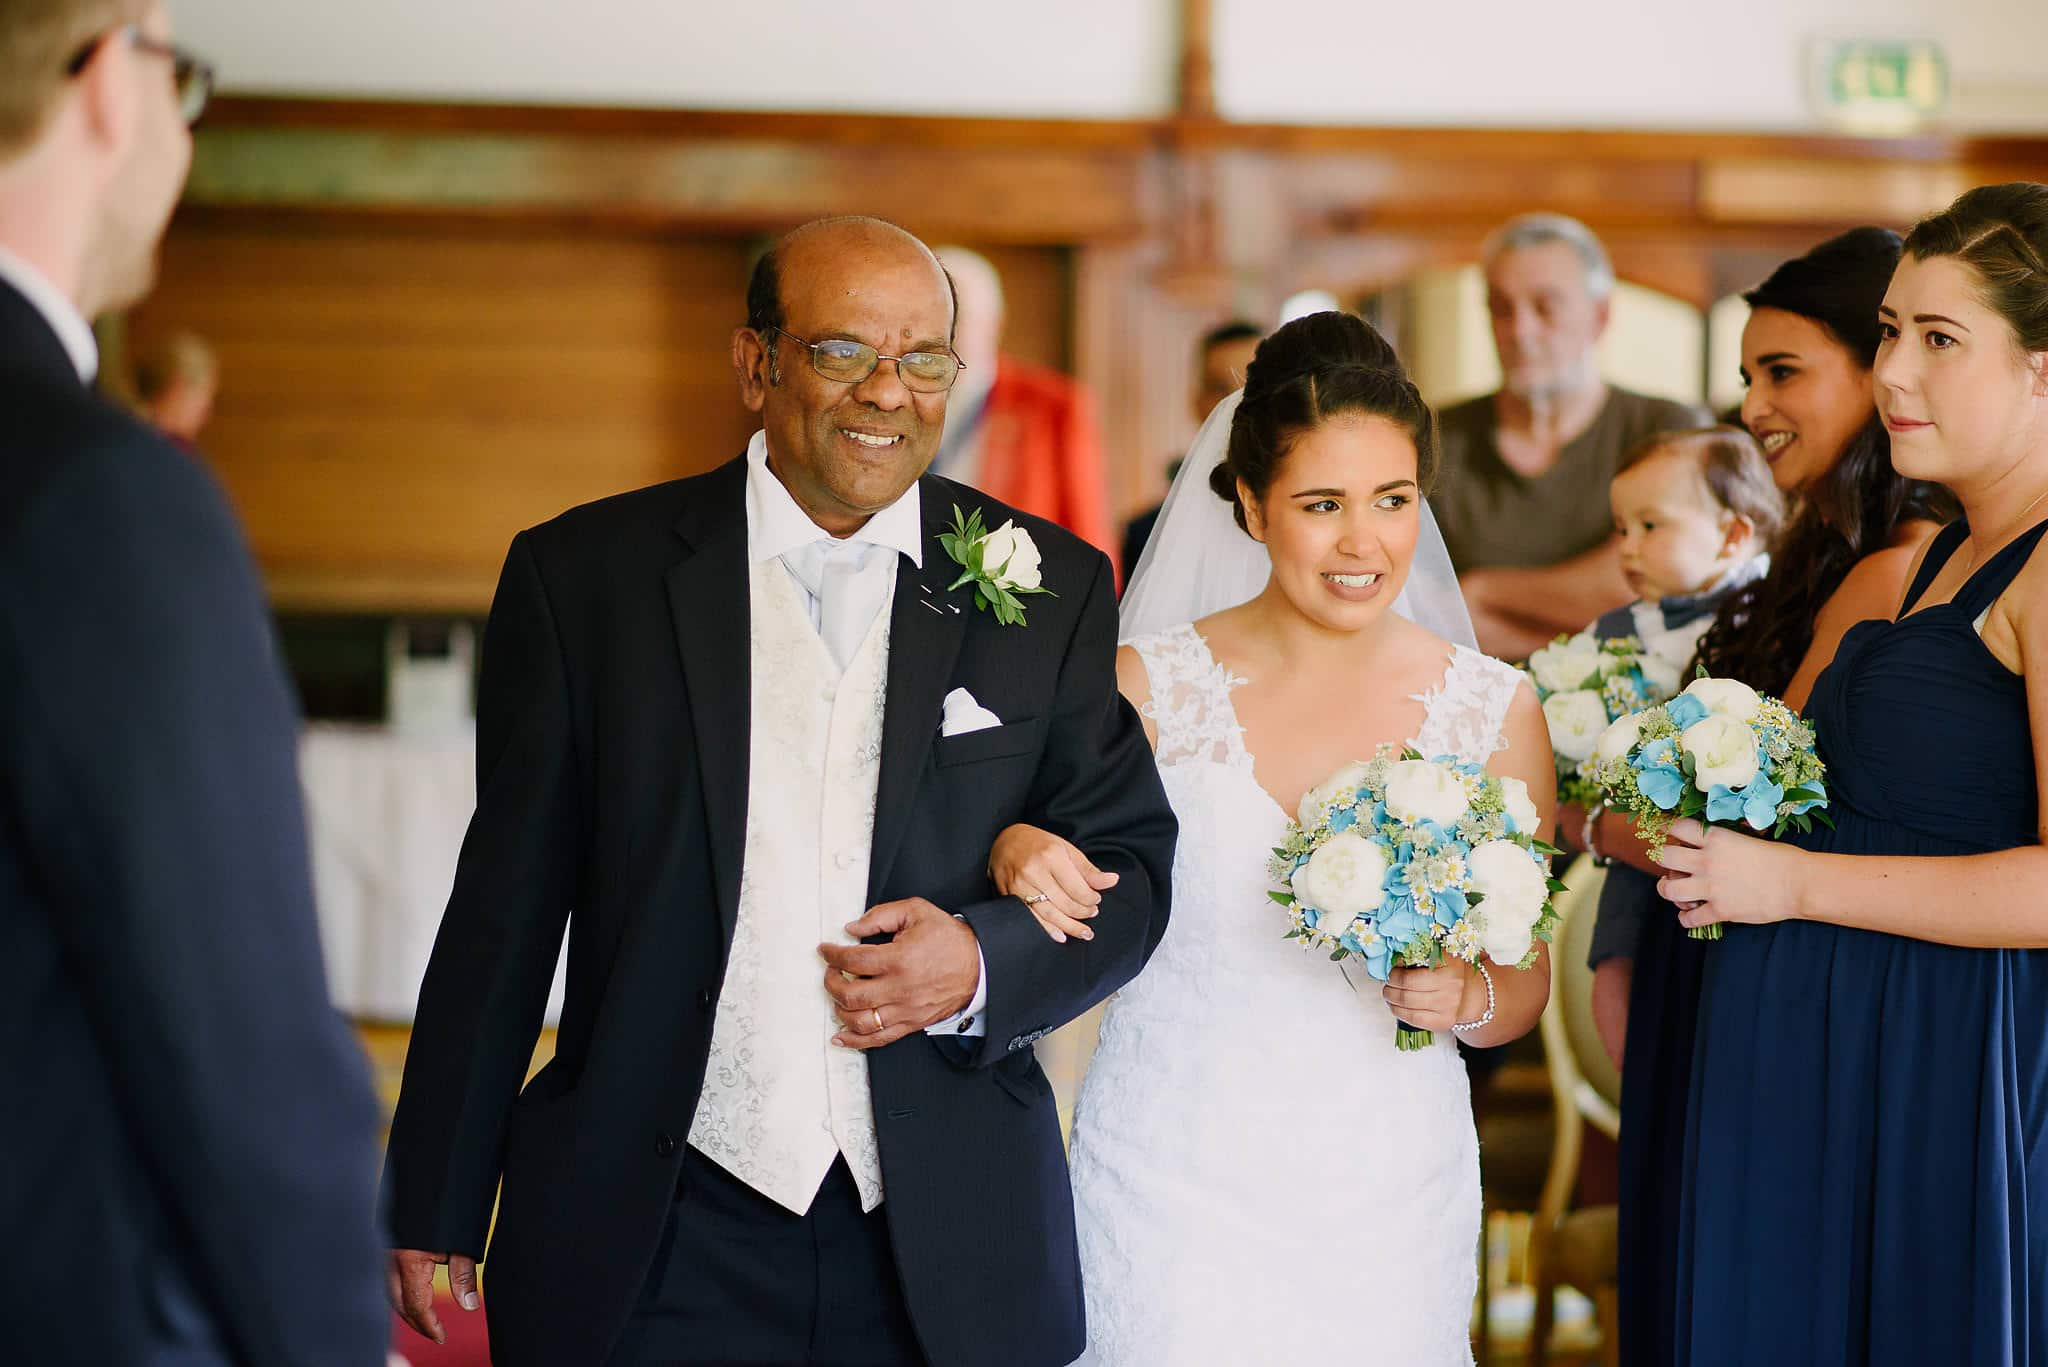 Tom & Amelia - Sprowston Manor Wedding 13